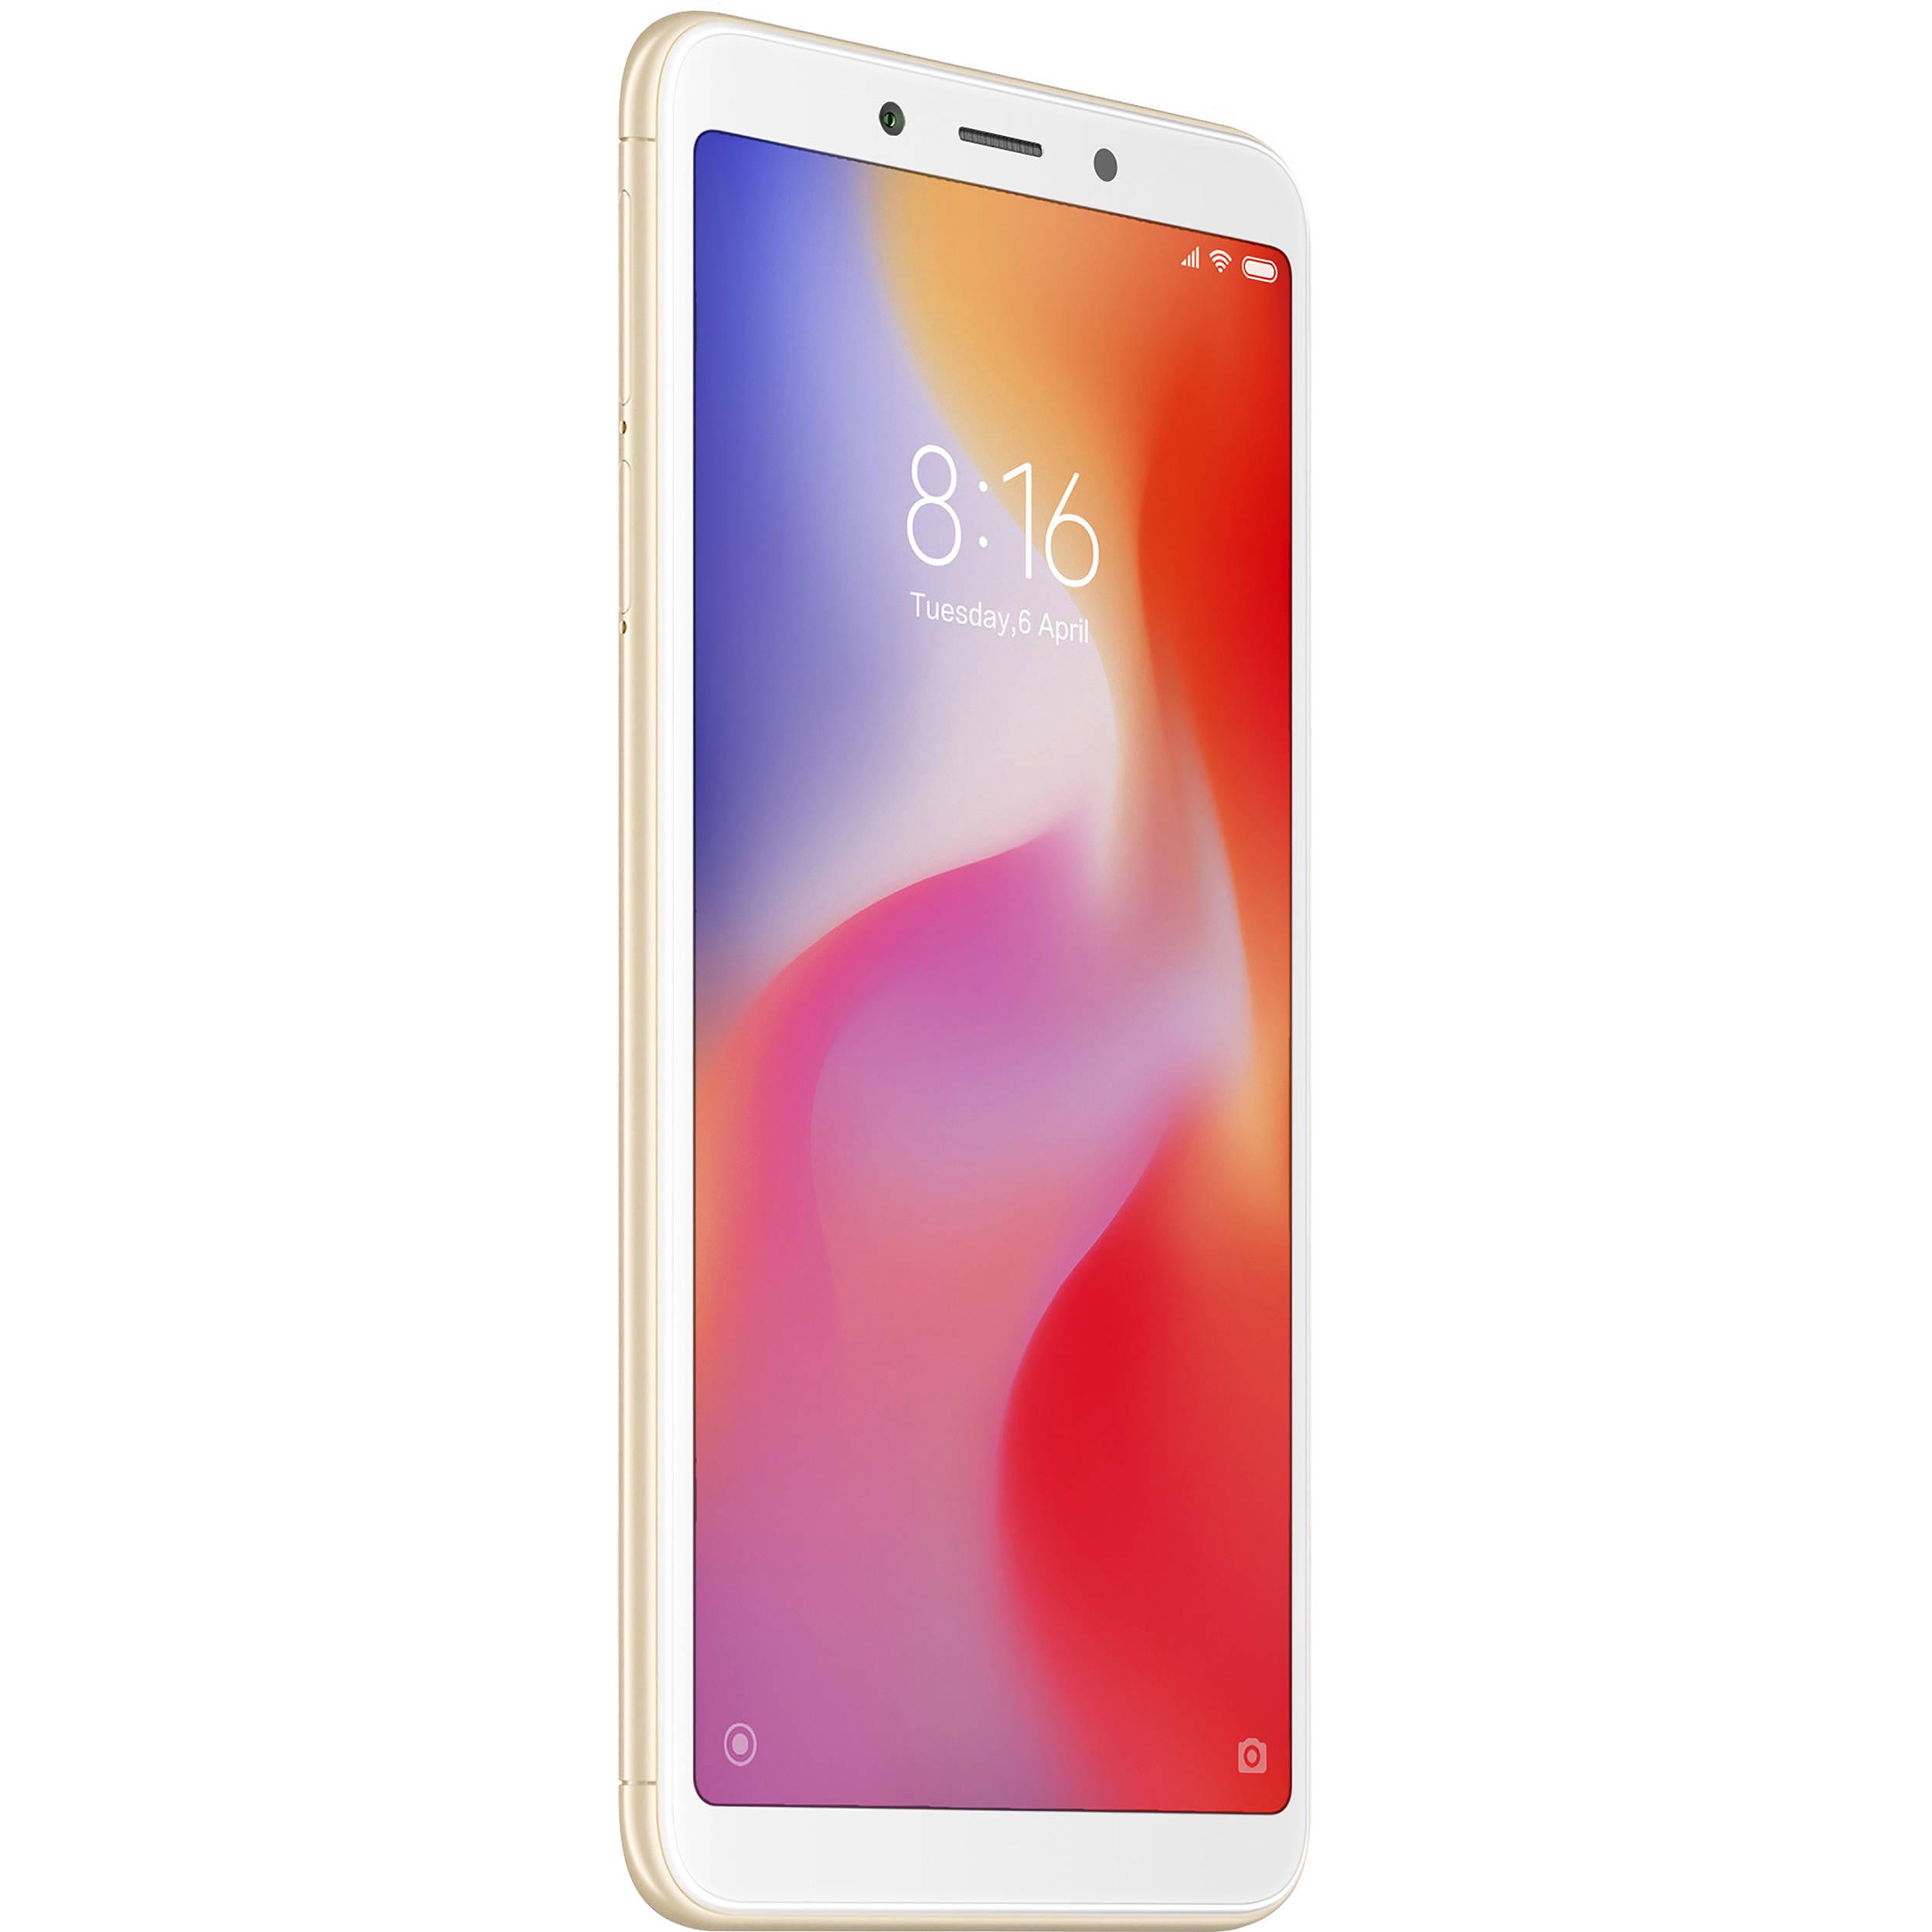 Xiaomi Redmi 6A Dual-SIM 16GB Smartphone (Unlocked, Gold)